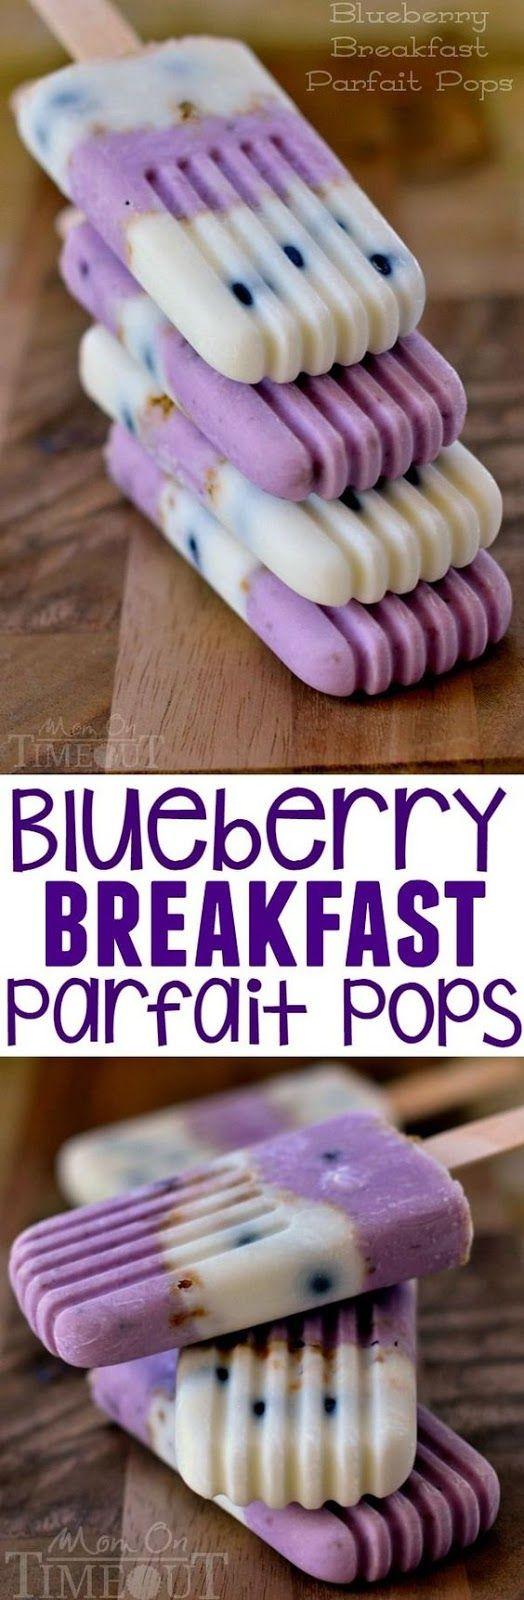 Ingredients For 4 Popsicles 4 Yoplait Greek Yogurts (2 Blueberry, 2 Vanilla) 4 Blueberry Nature Valley Breakfast Biscuits, crus...